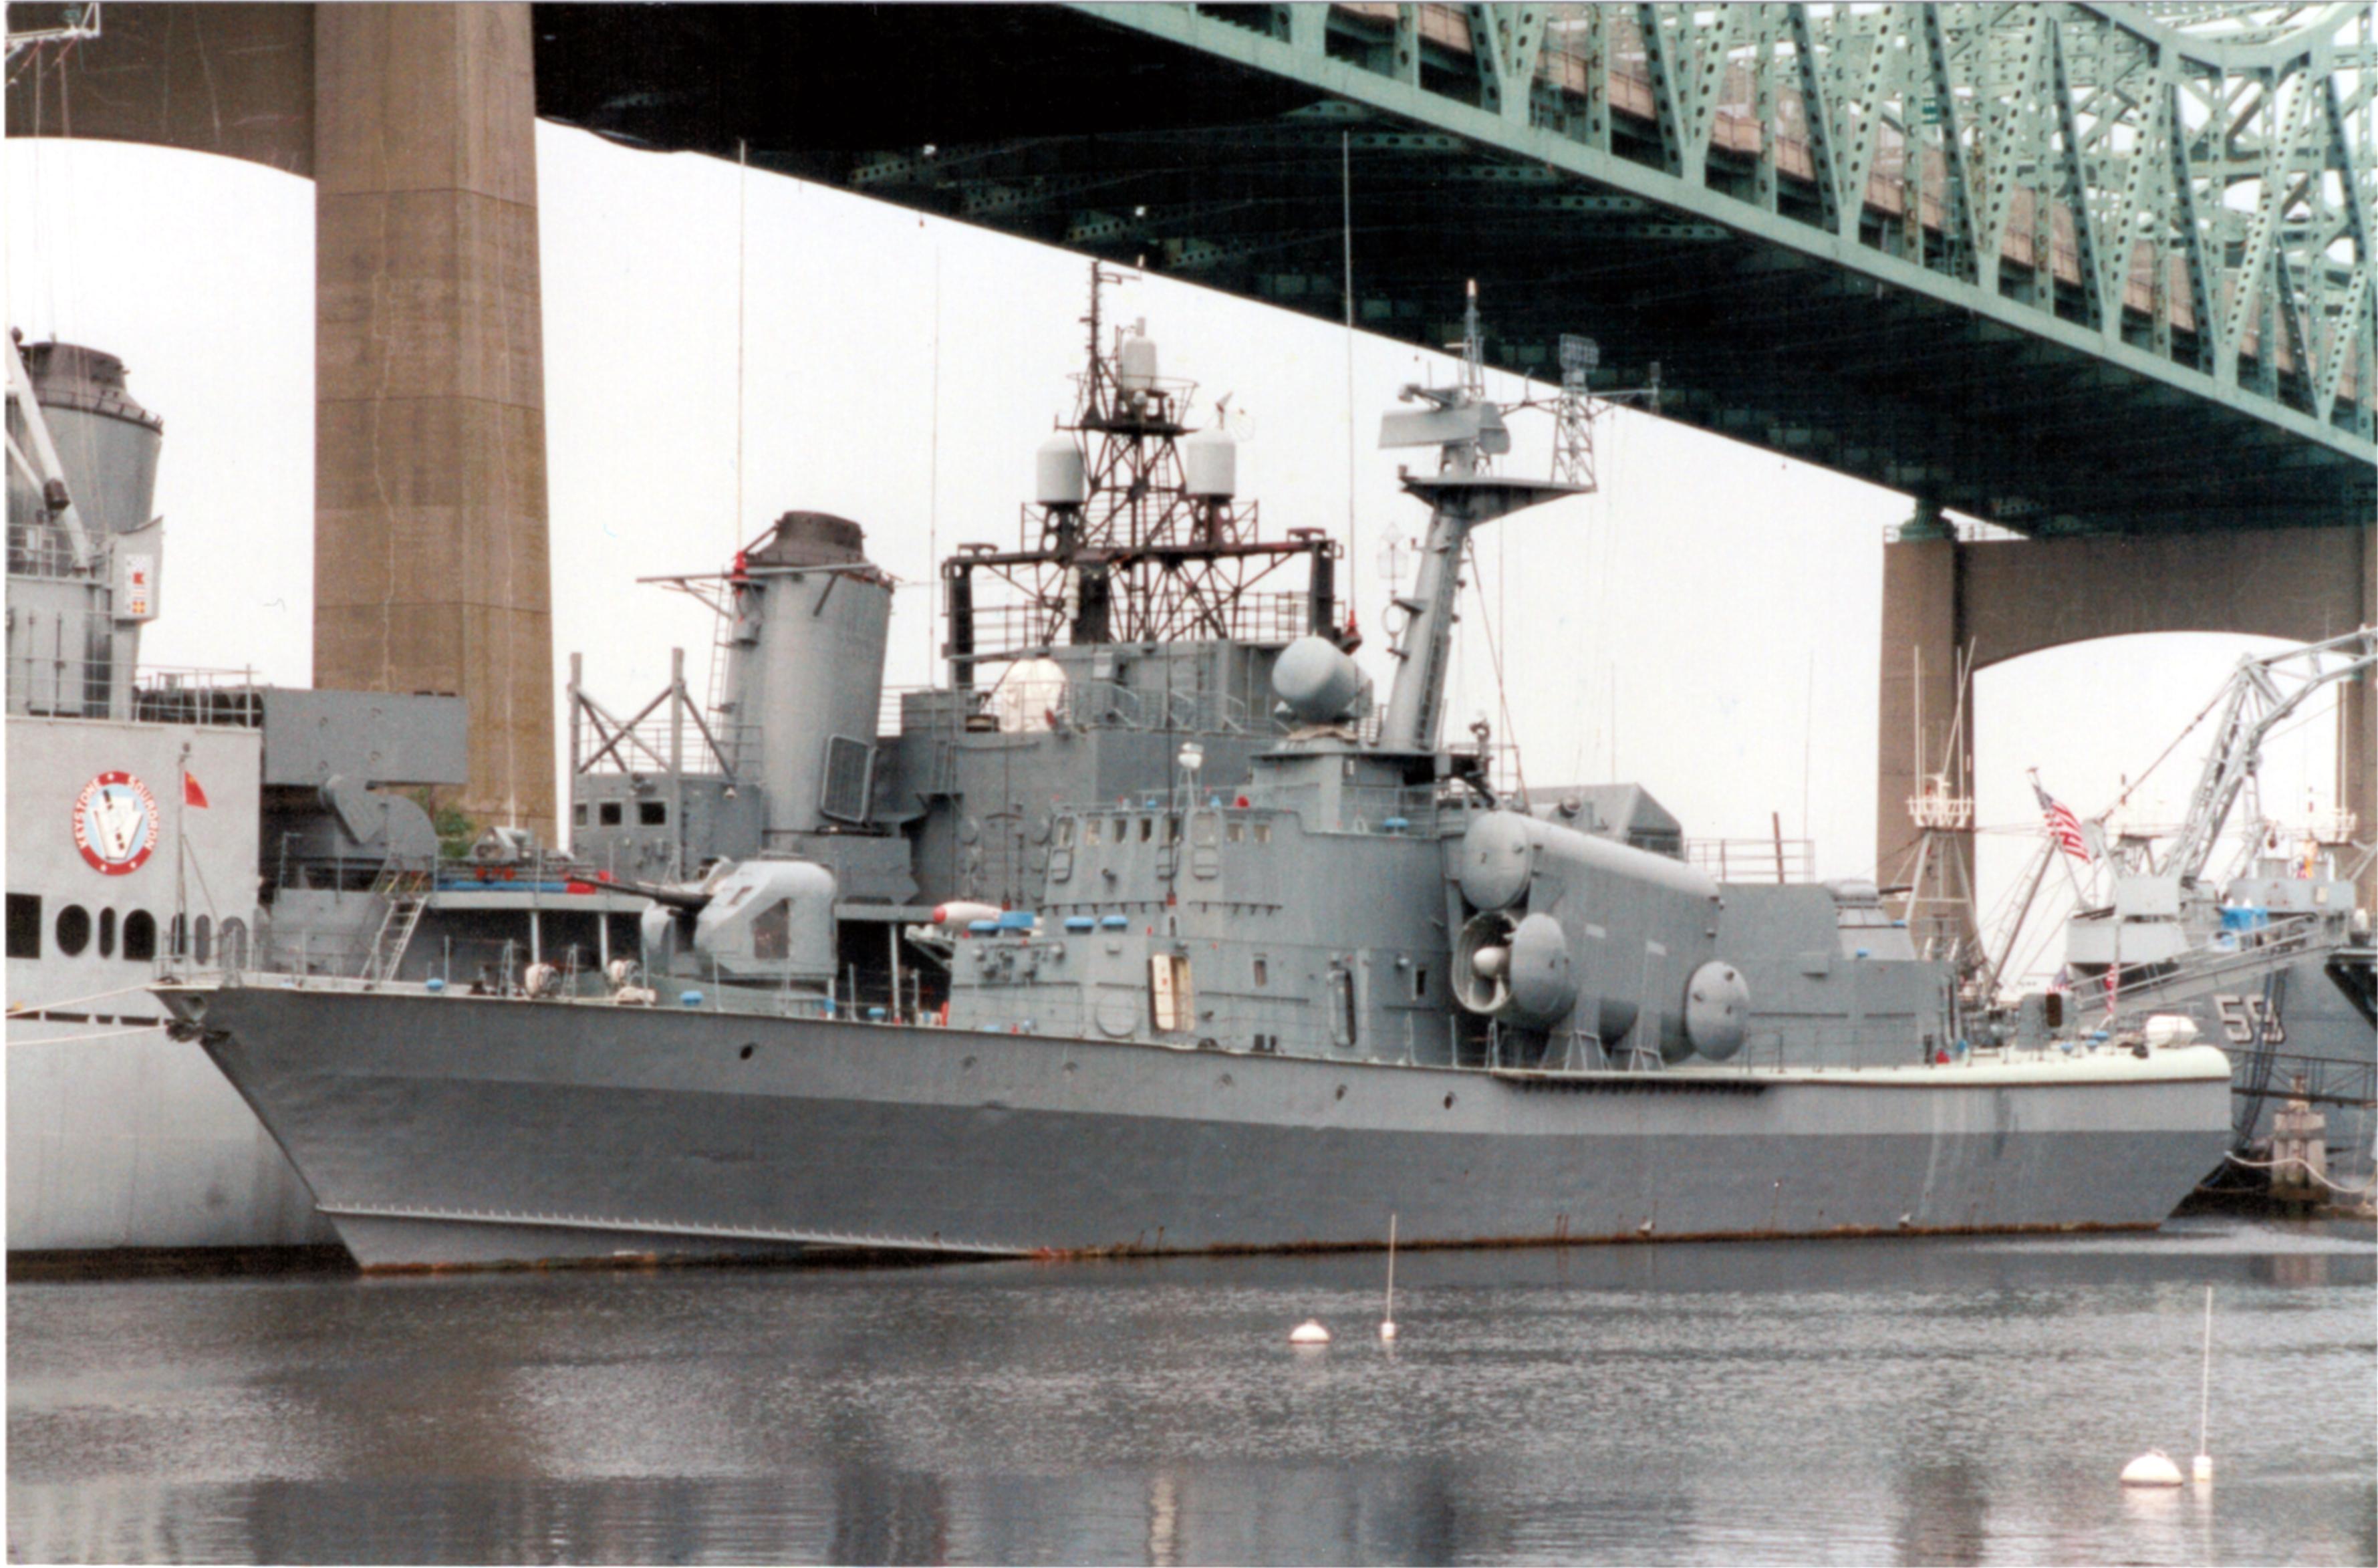 "Letzter Liegeplatz des kleinen Raketenschiffes ""Hiddensee"" neben dem Schlachtschiff ""Massachusetts"" in Fall River. Bild: Klaus-Peter Gödde, Mai 1994"